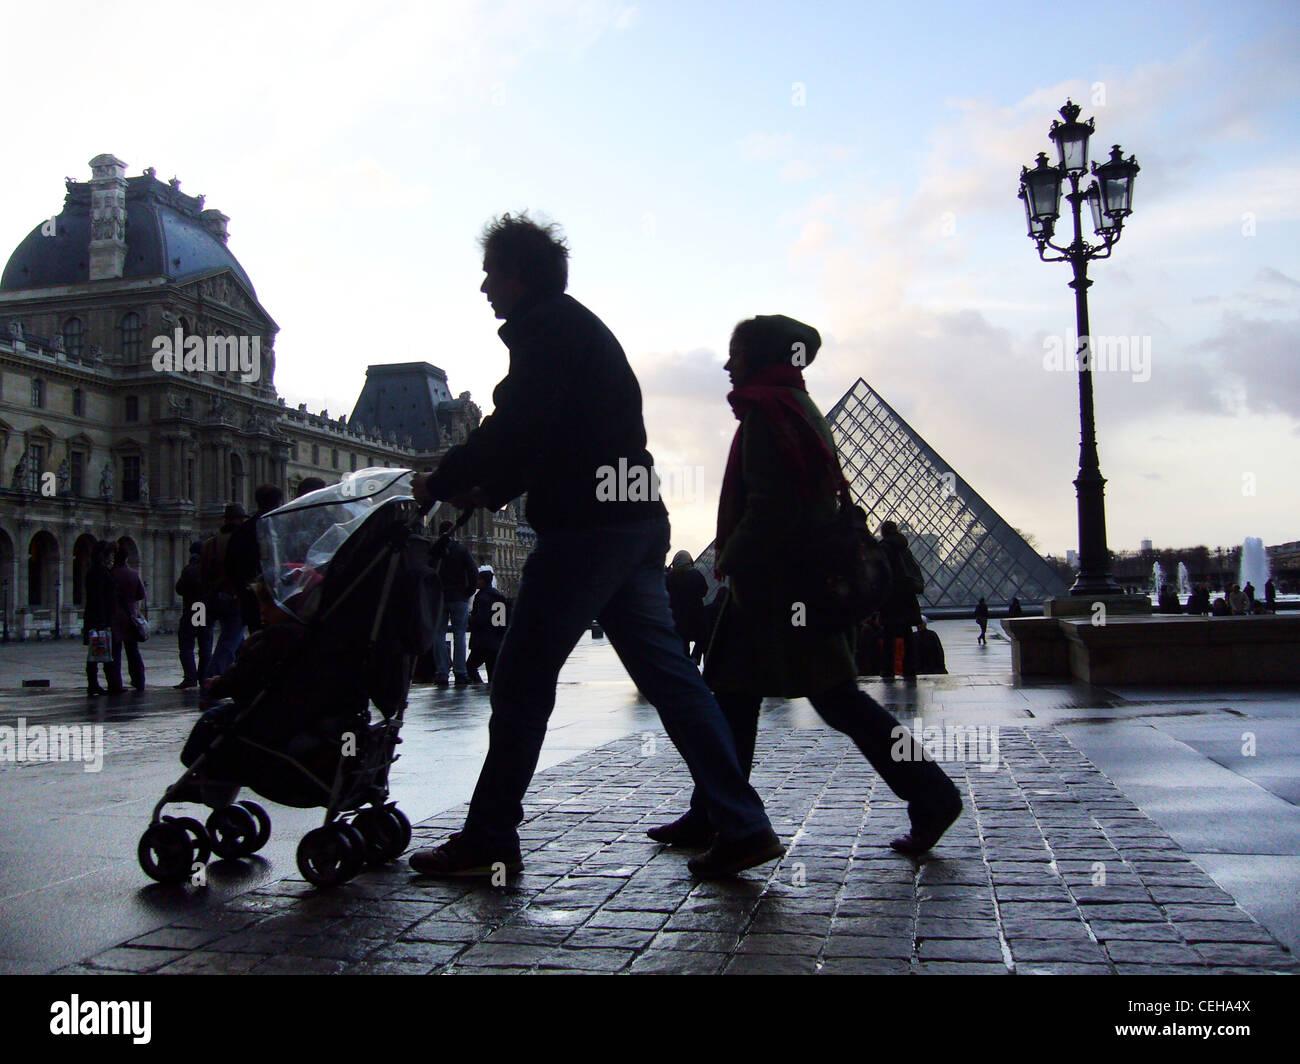 Silhouetten an einem regnerischen Tag in Place du Carrousel du Louvre, Paris, Frankreich Stockbild